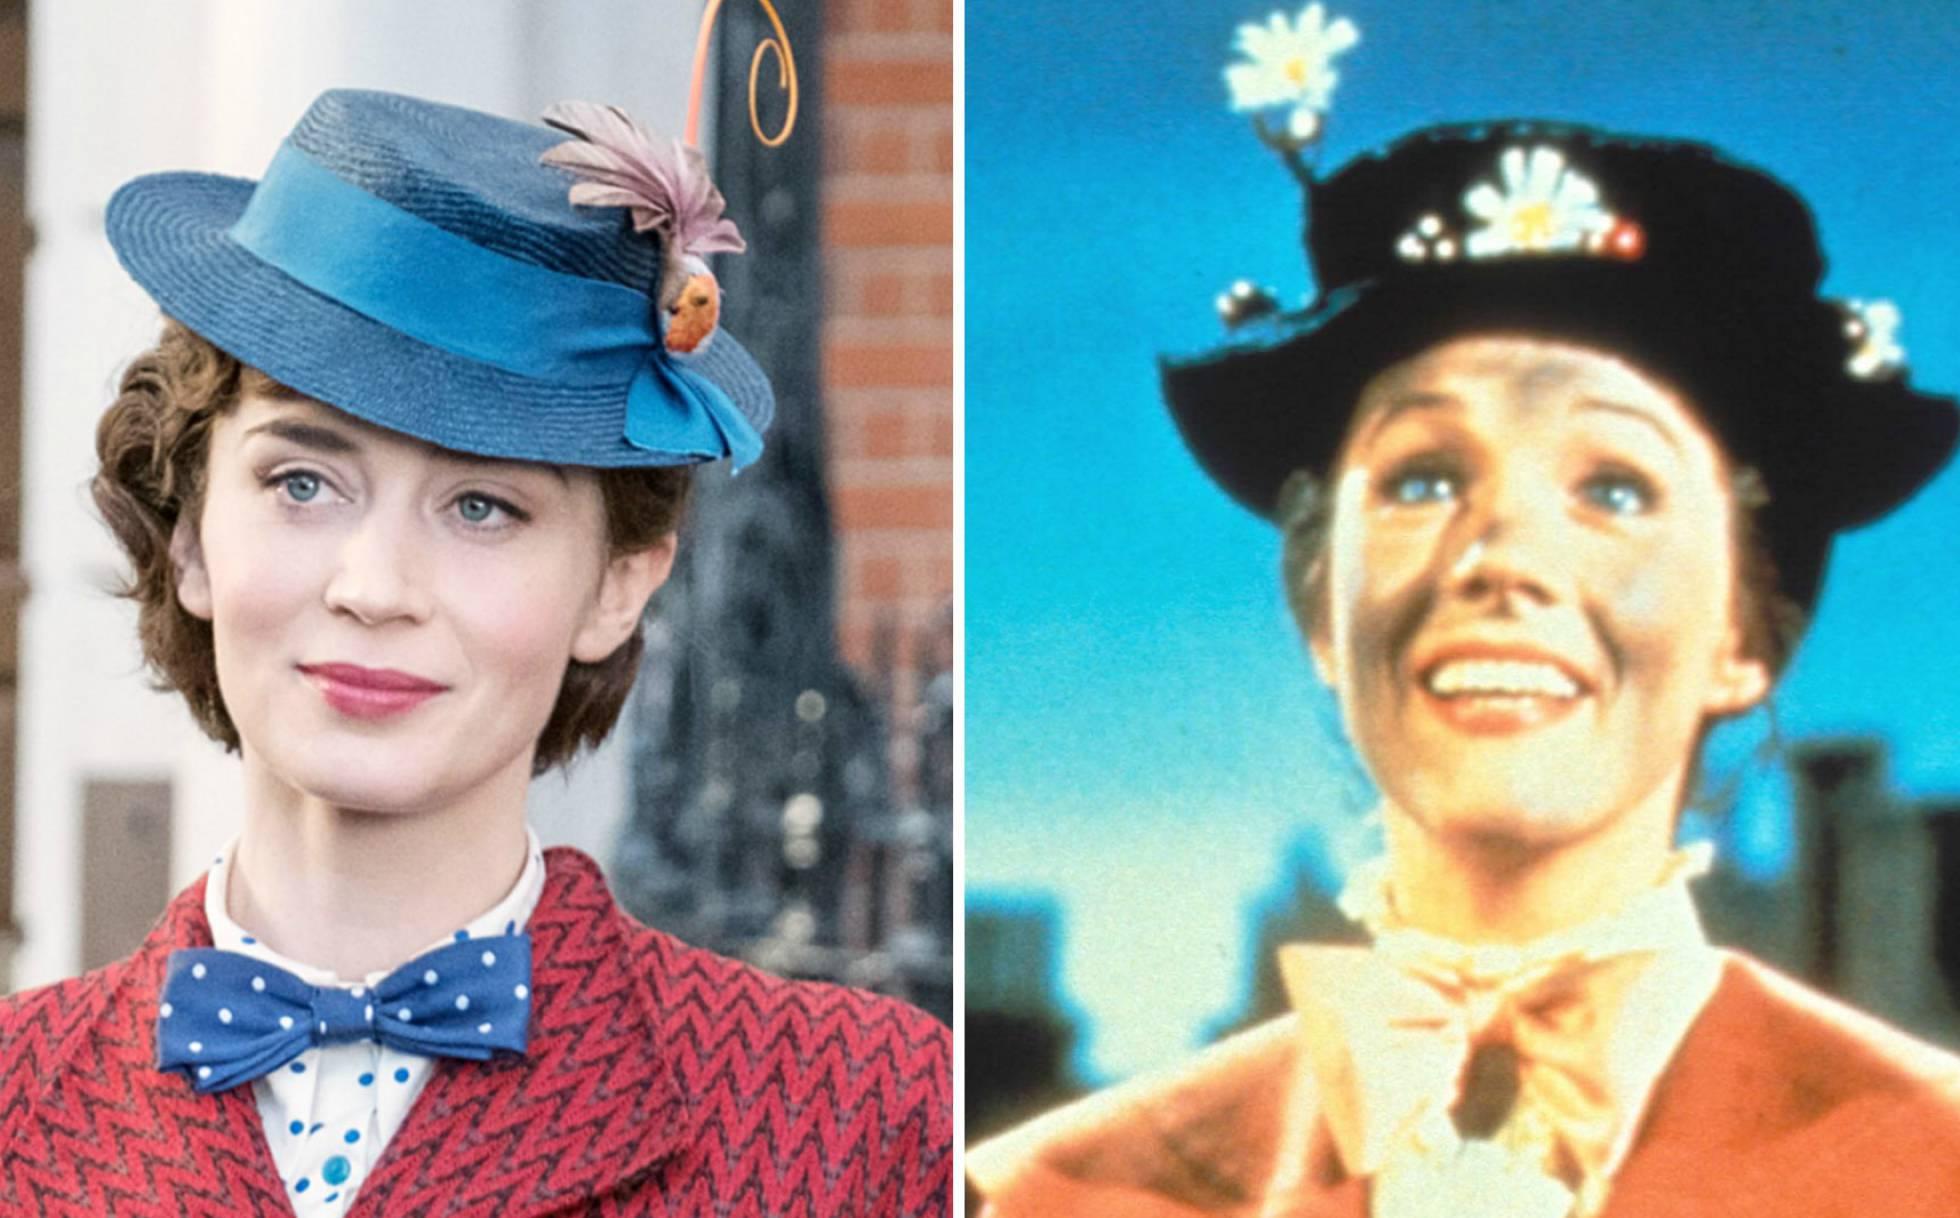 Emily Blunt o Julie Andrews, ¿quién es la mejor Mary Poppins?